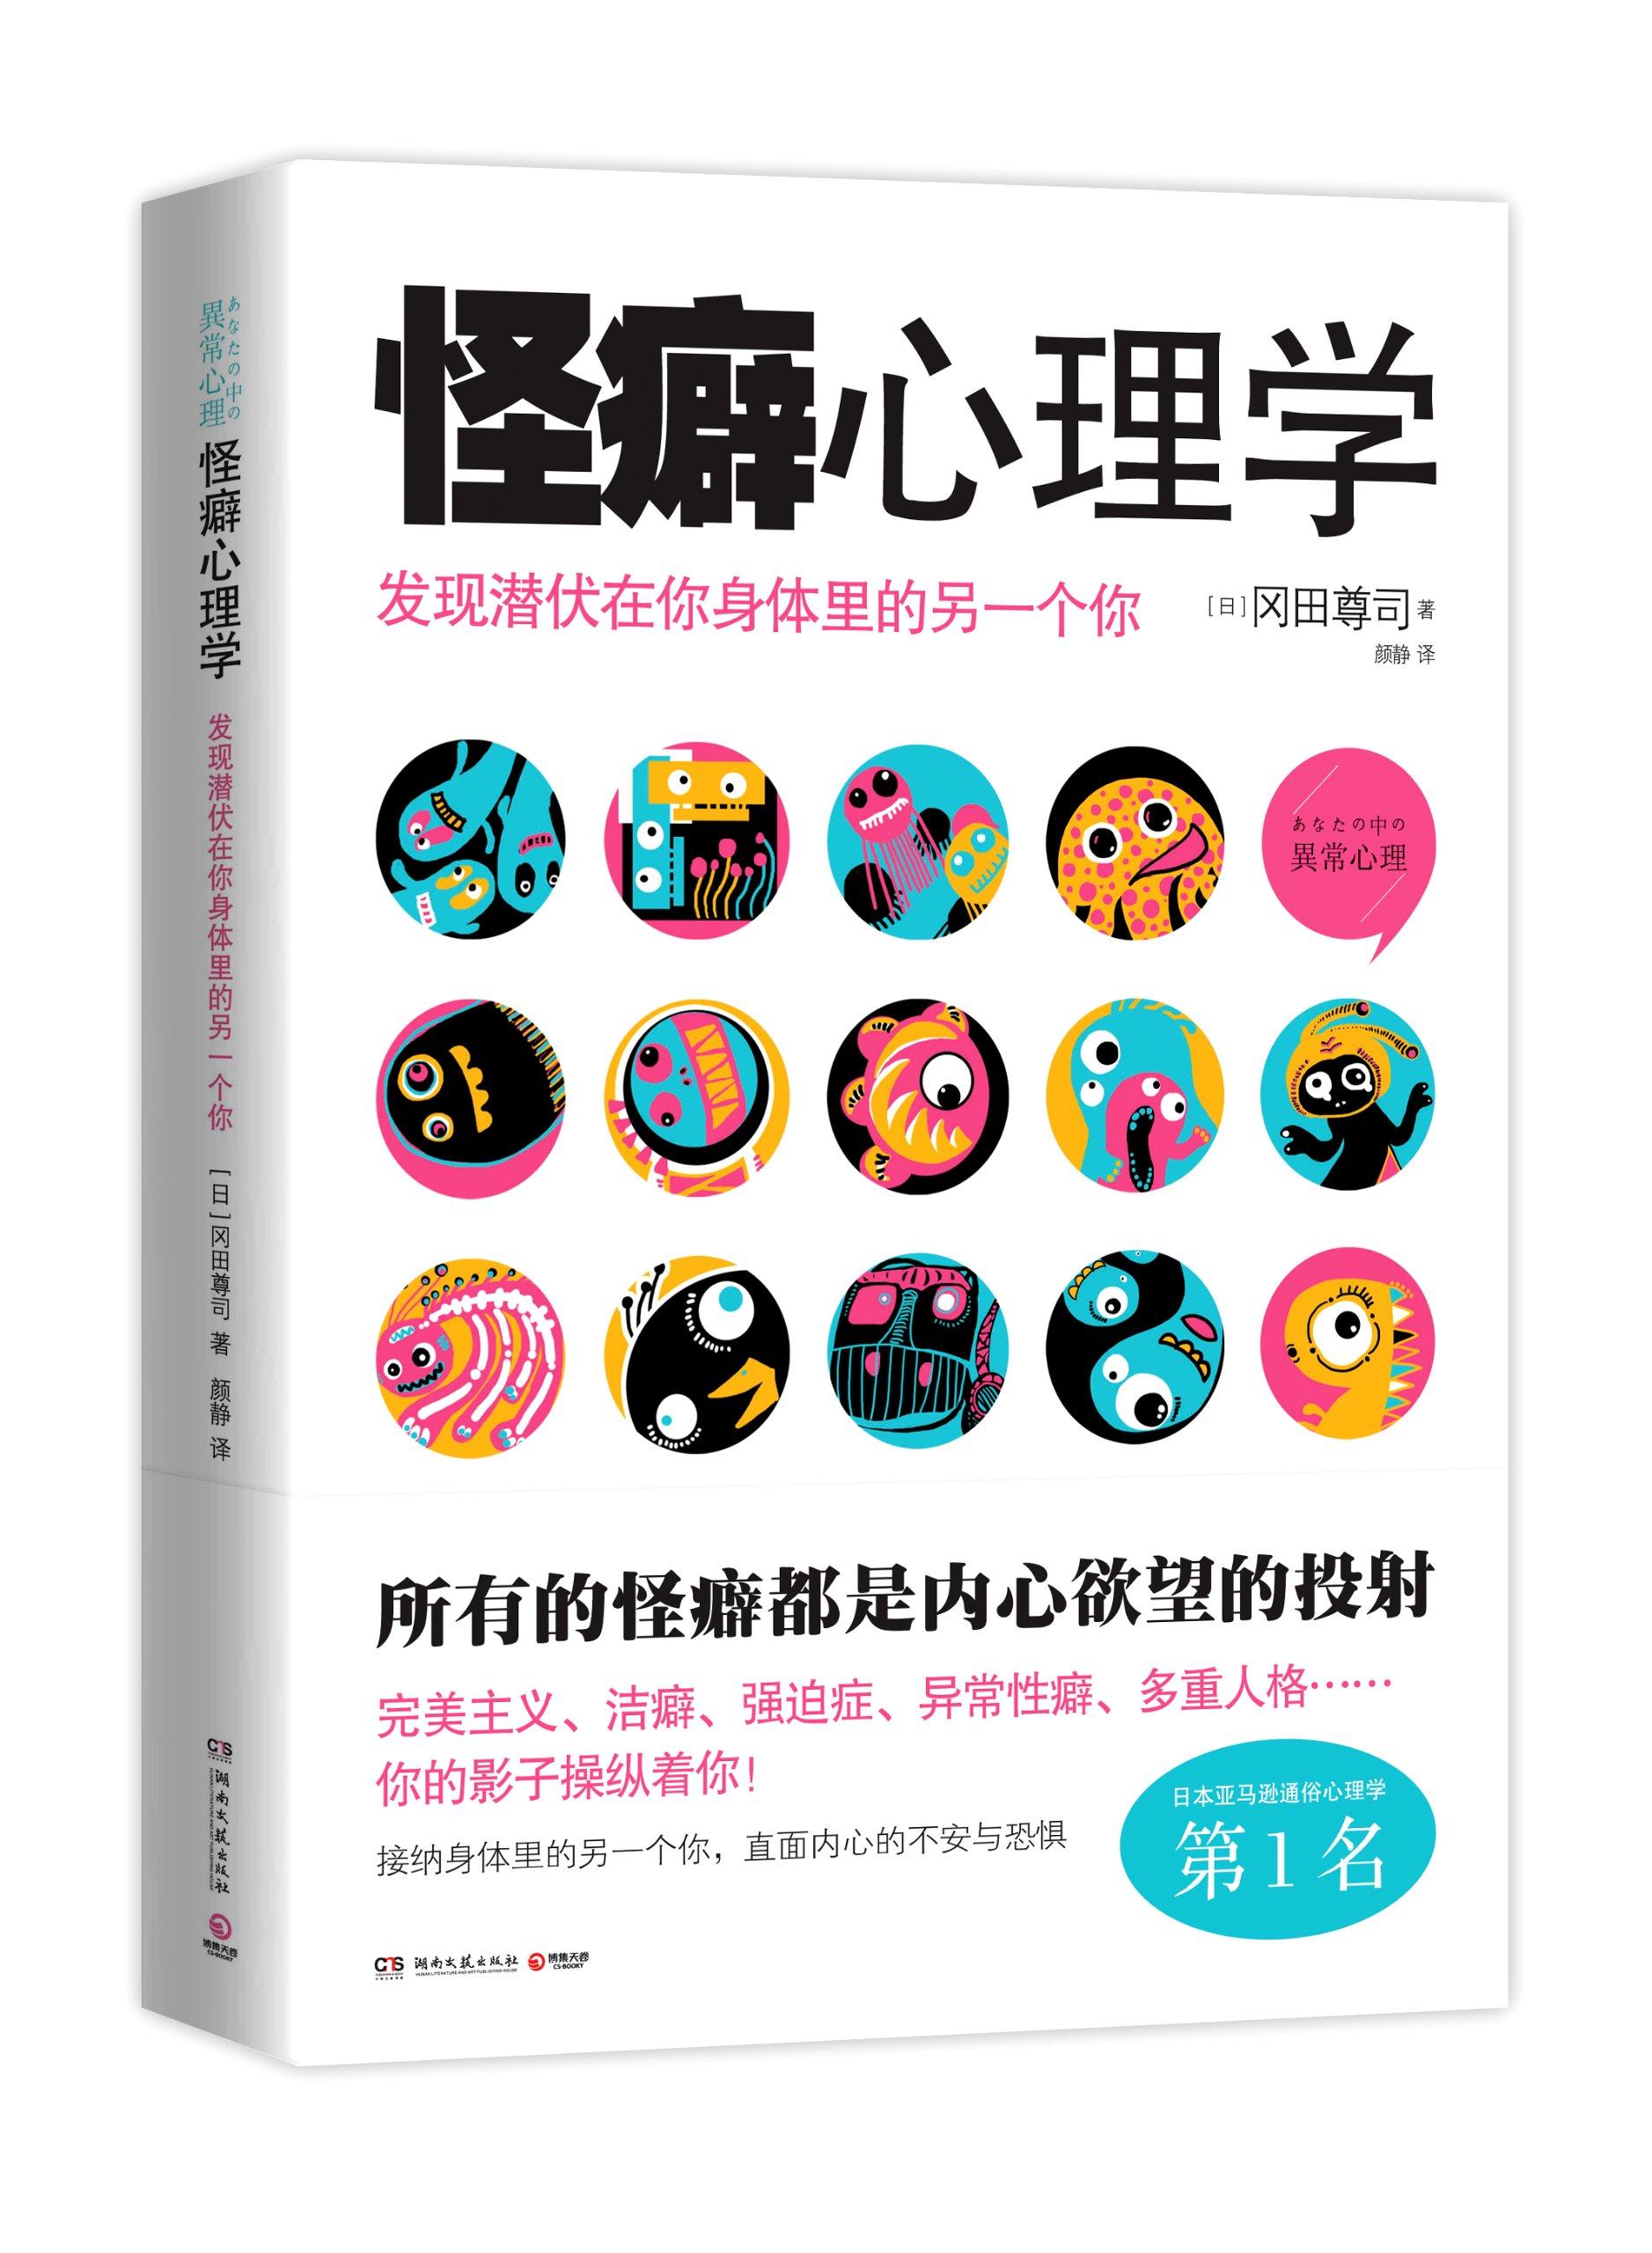 Amazon.it: 怪癖心理学:发现潜...